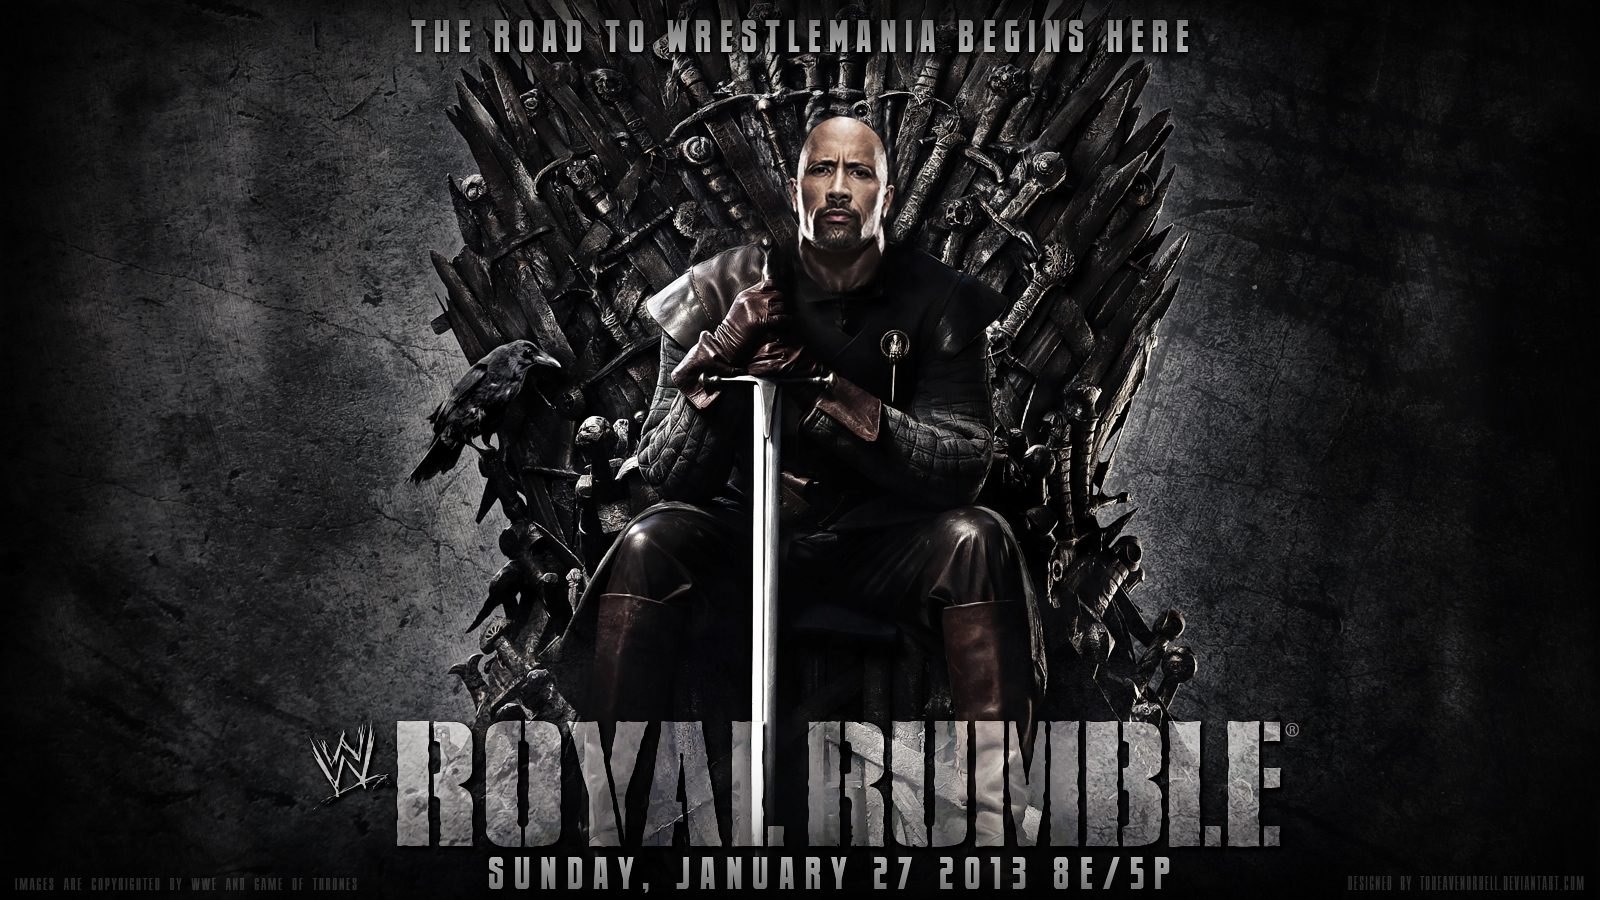 WWE Royal Rumble 2013 Wallpaper The Rock By ToHeavenOrHell